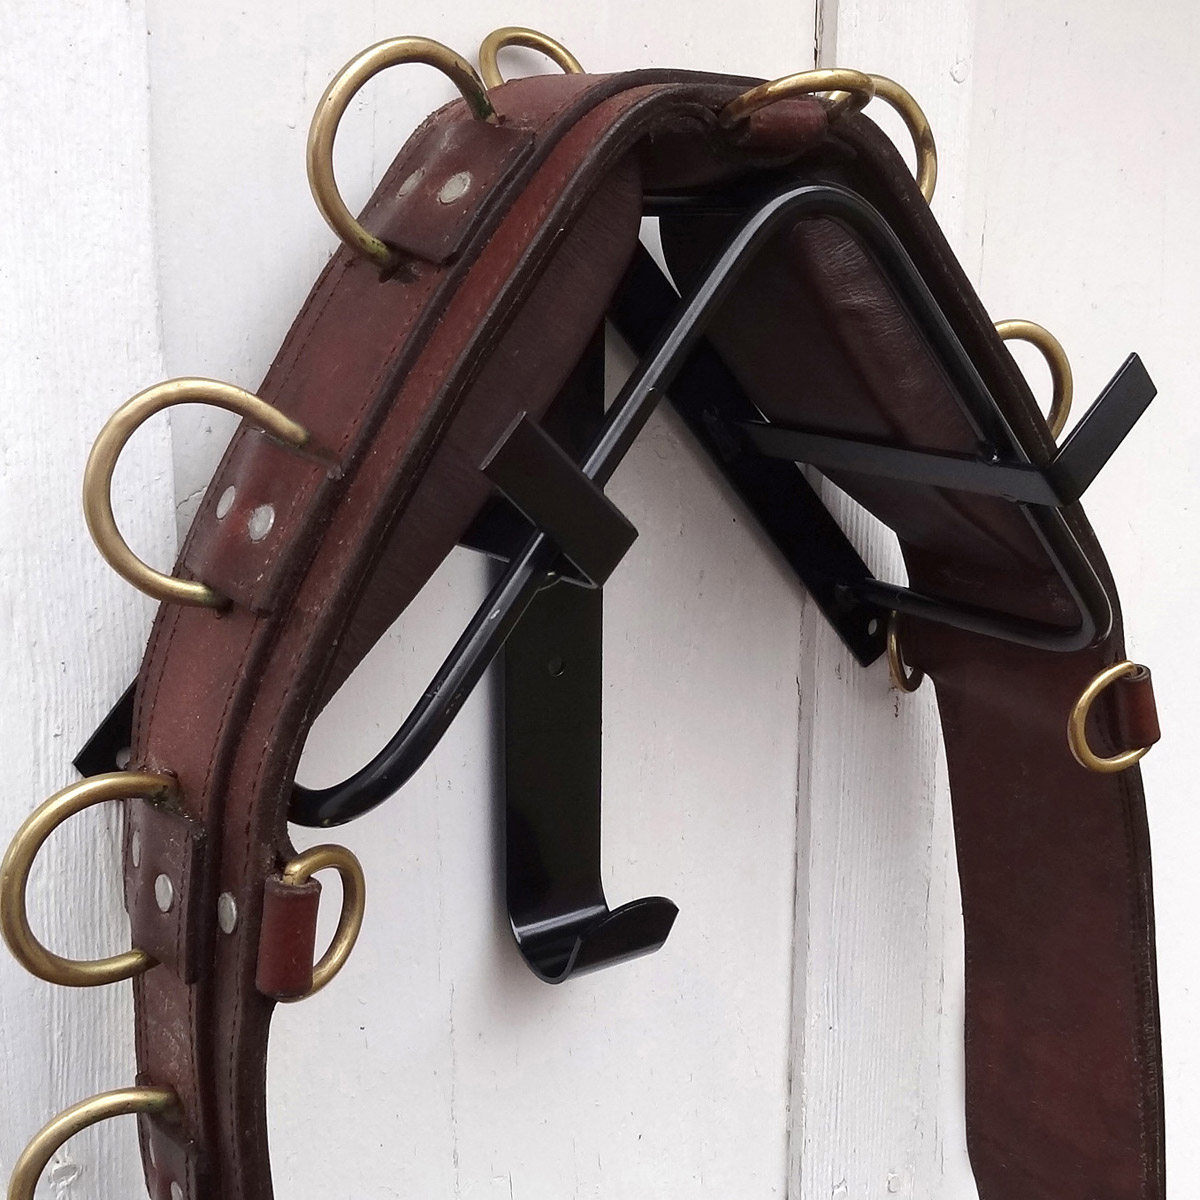 Black Storage Rack For Surcingles And Harness Saddles